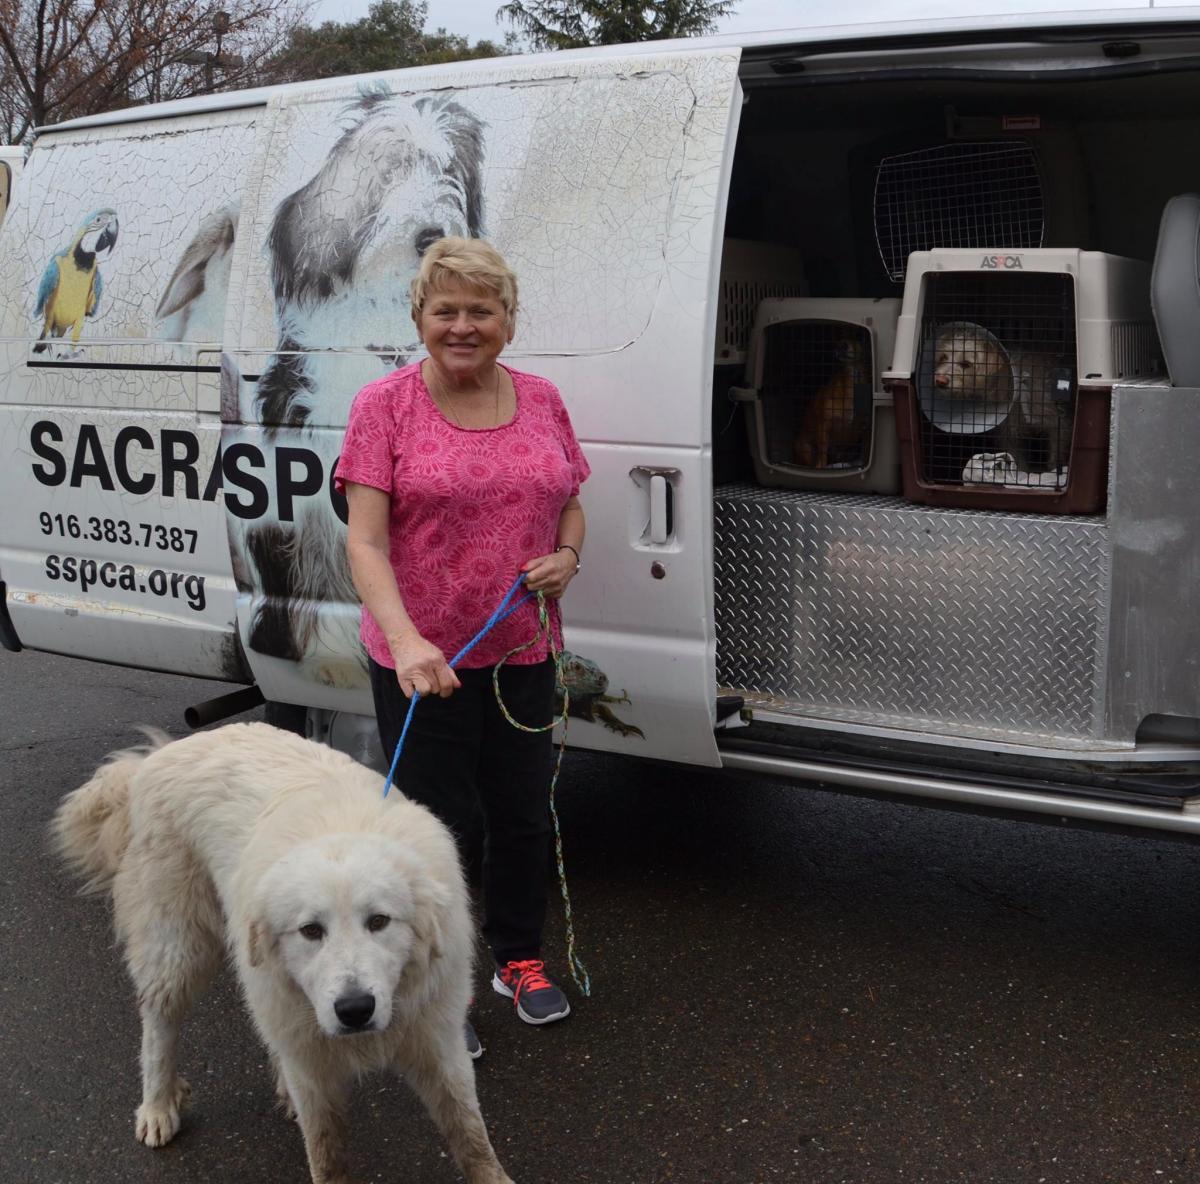 7a4bbe5558 Did you know the Sacramento SPCA has a robust transfer program  Since 2016